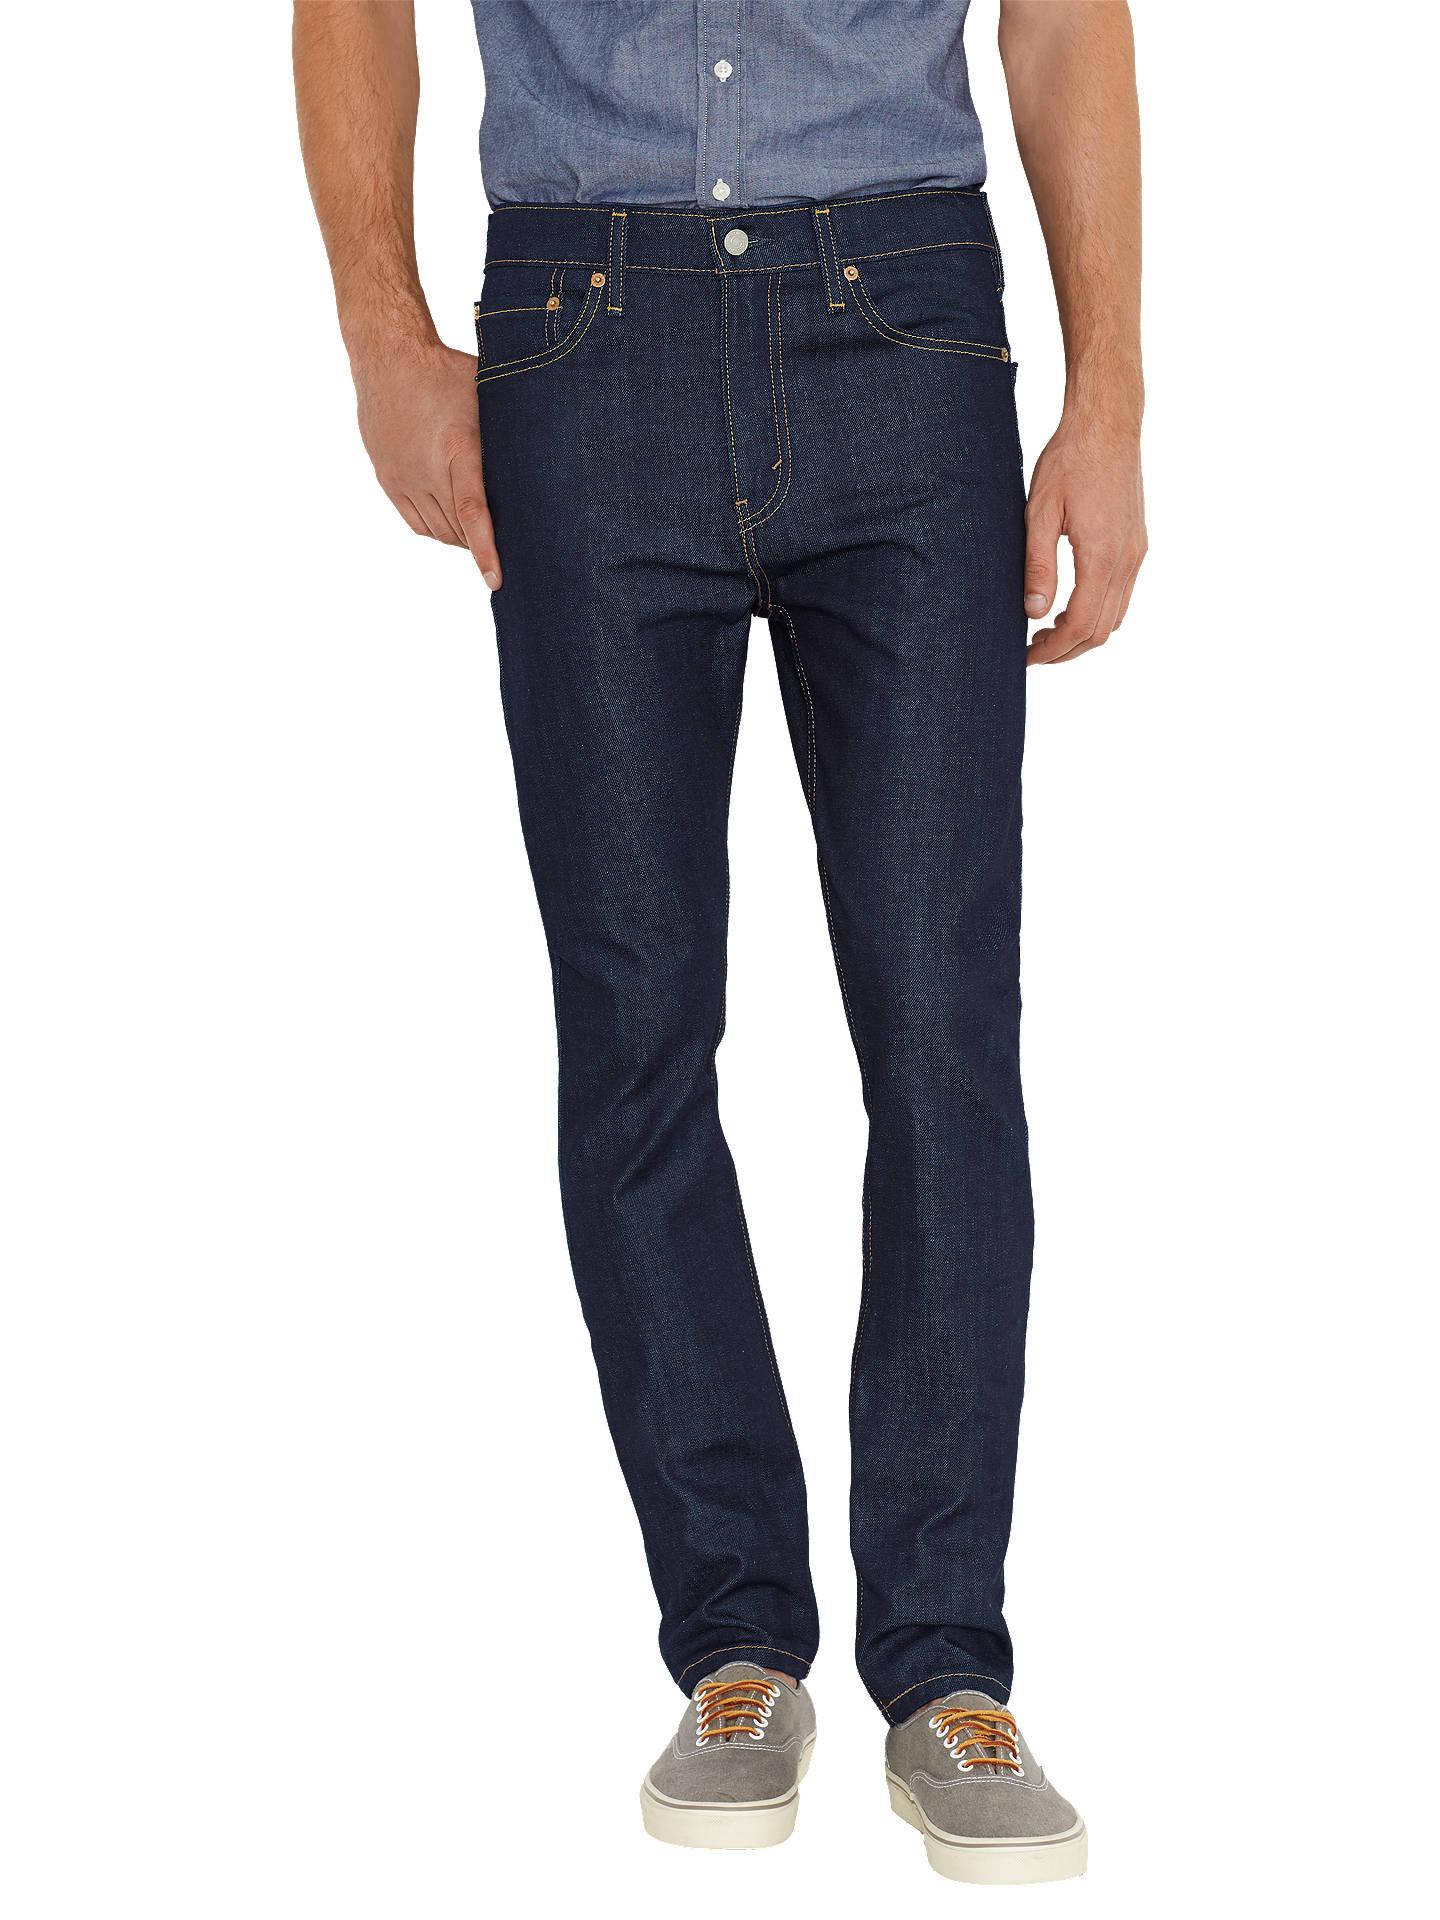 Levi's 510 Skinny Jeans, Broken Raw at John Lewis & Partners